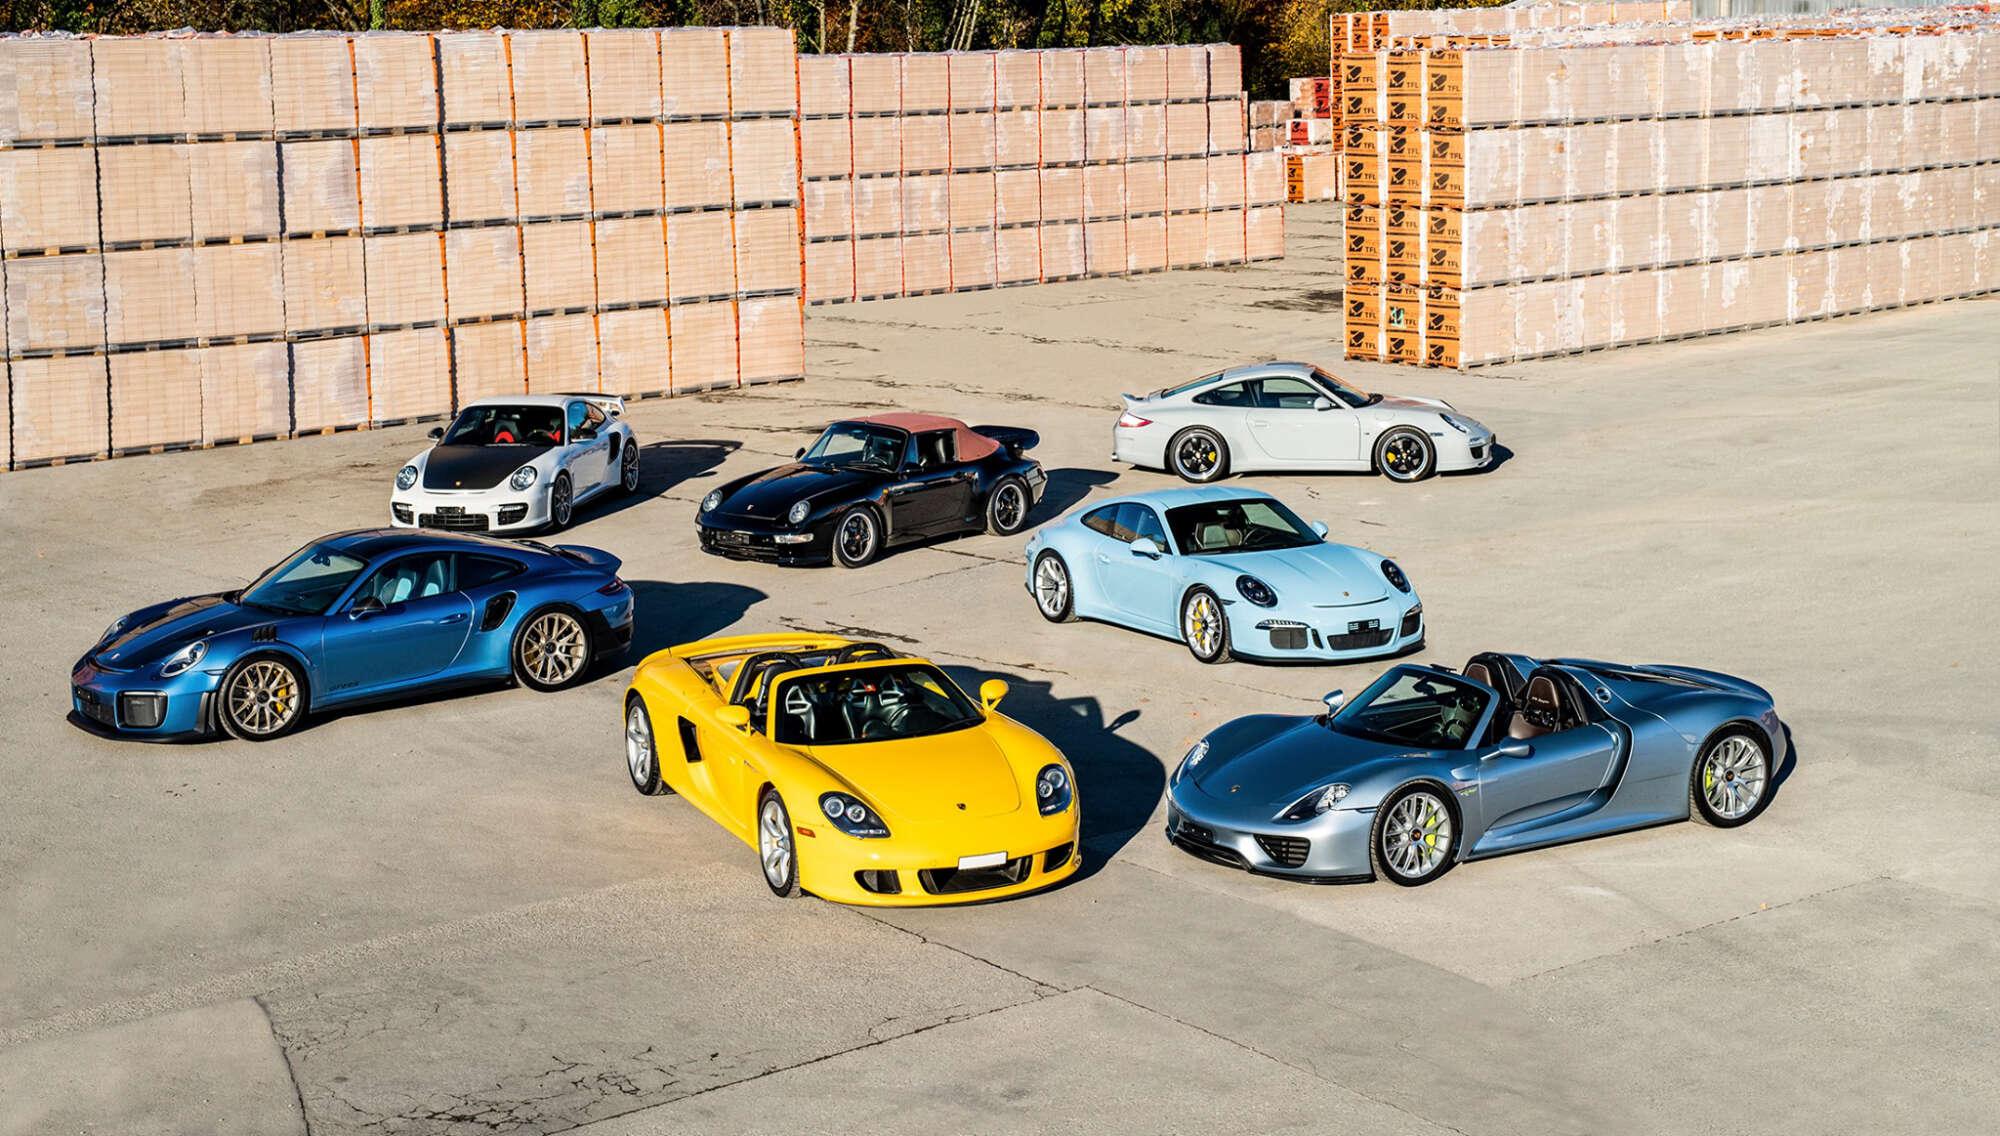 The Swiss <br /> Porsche Collection